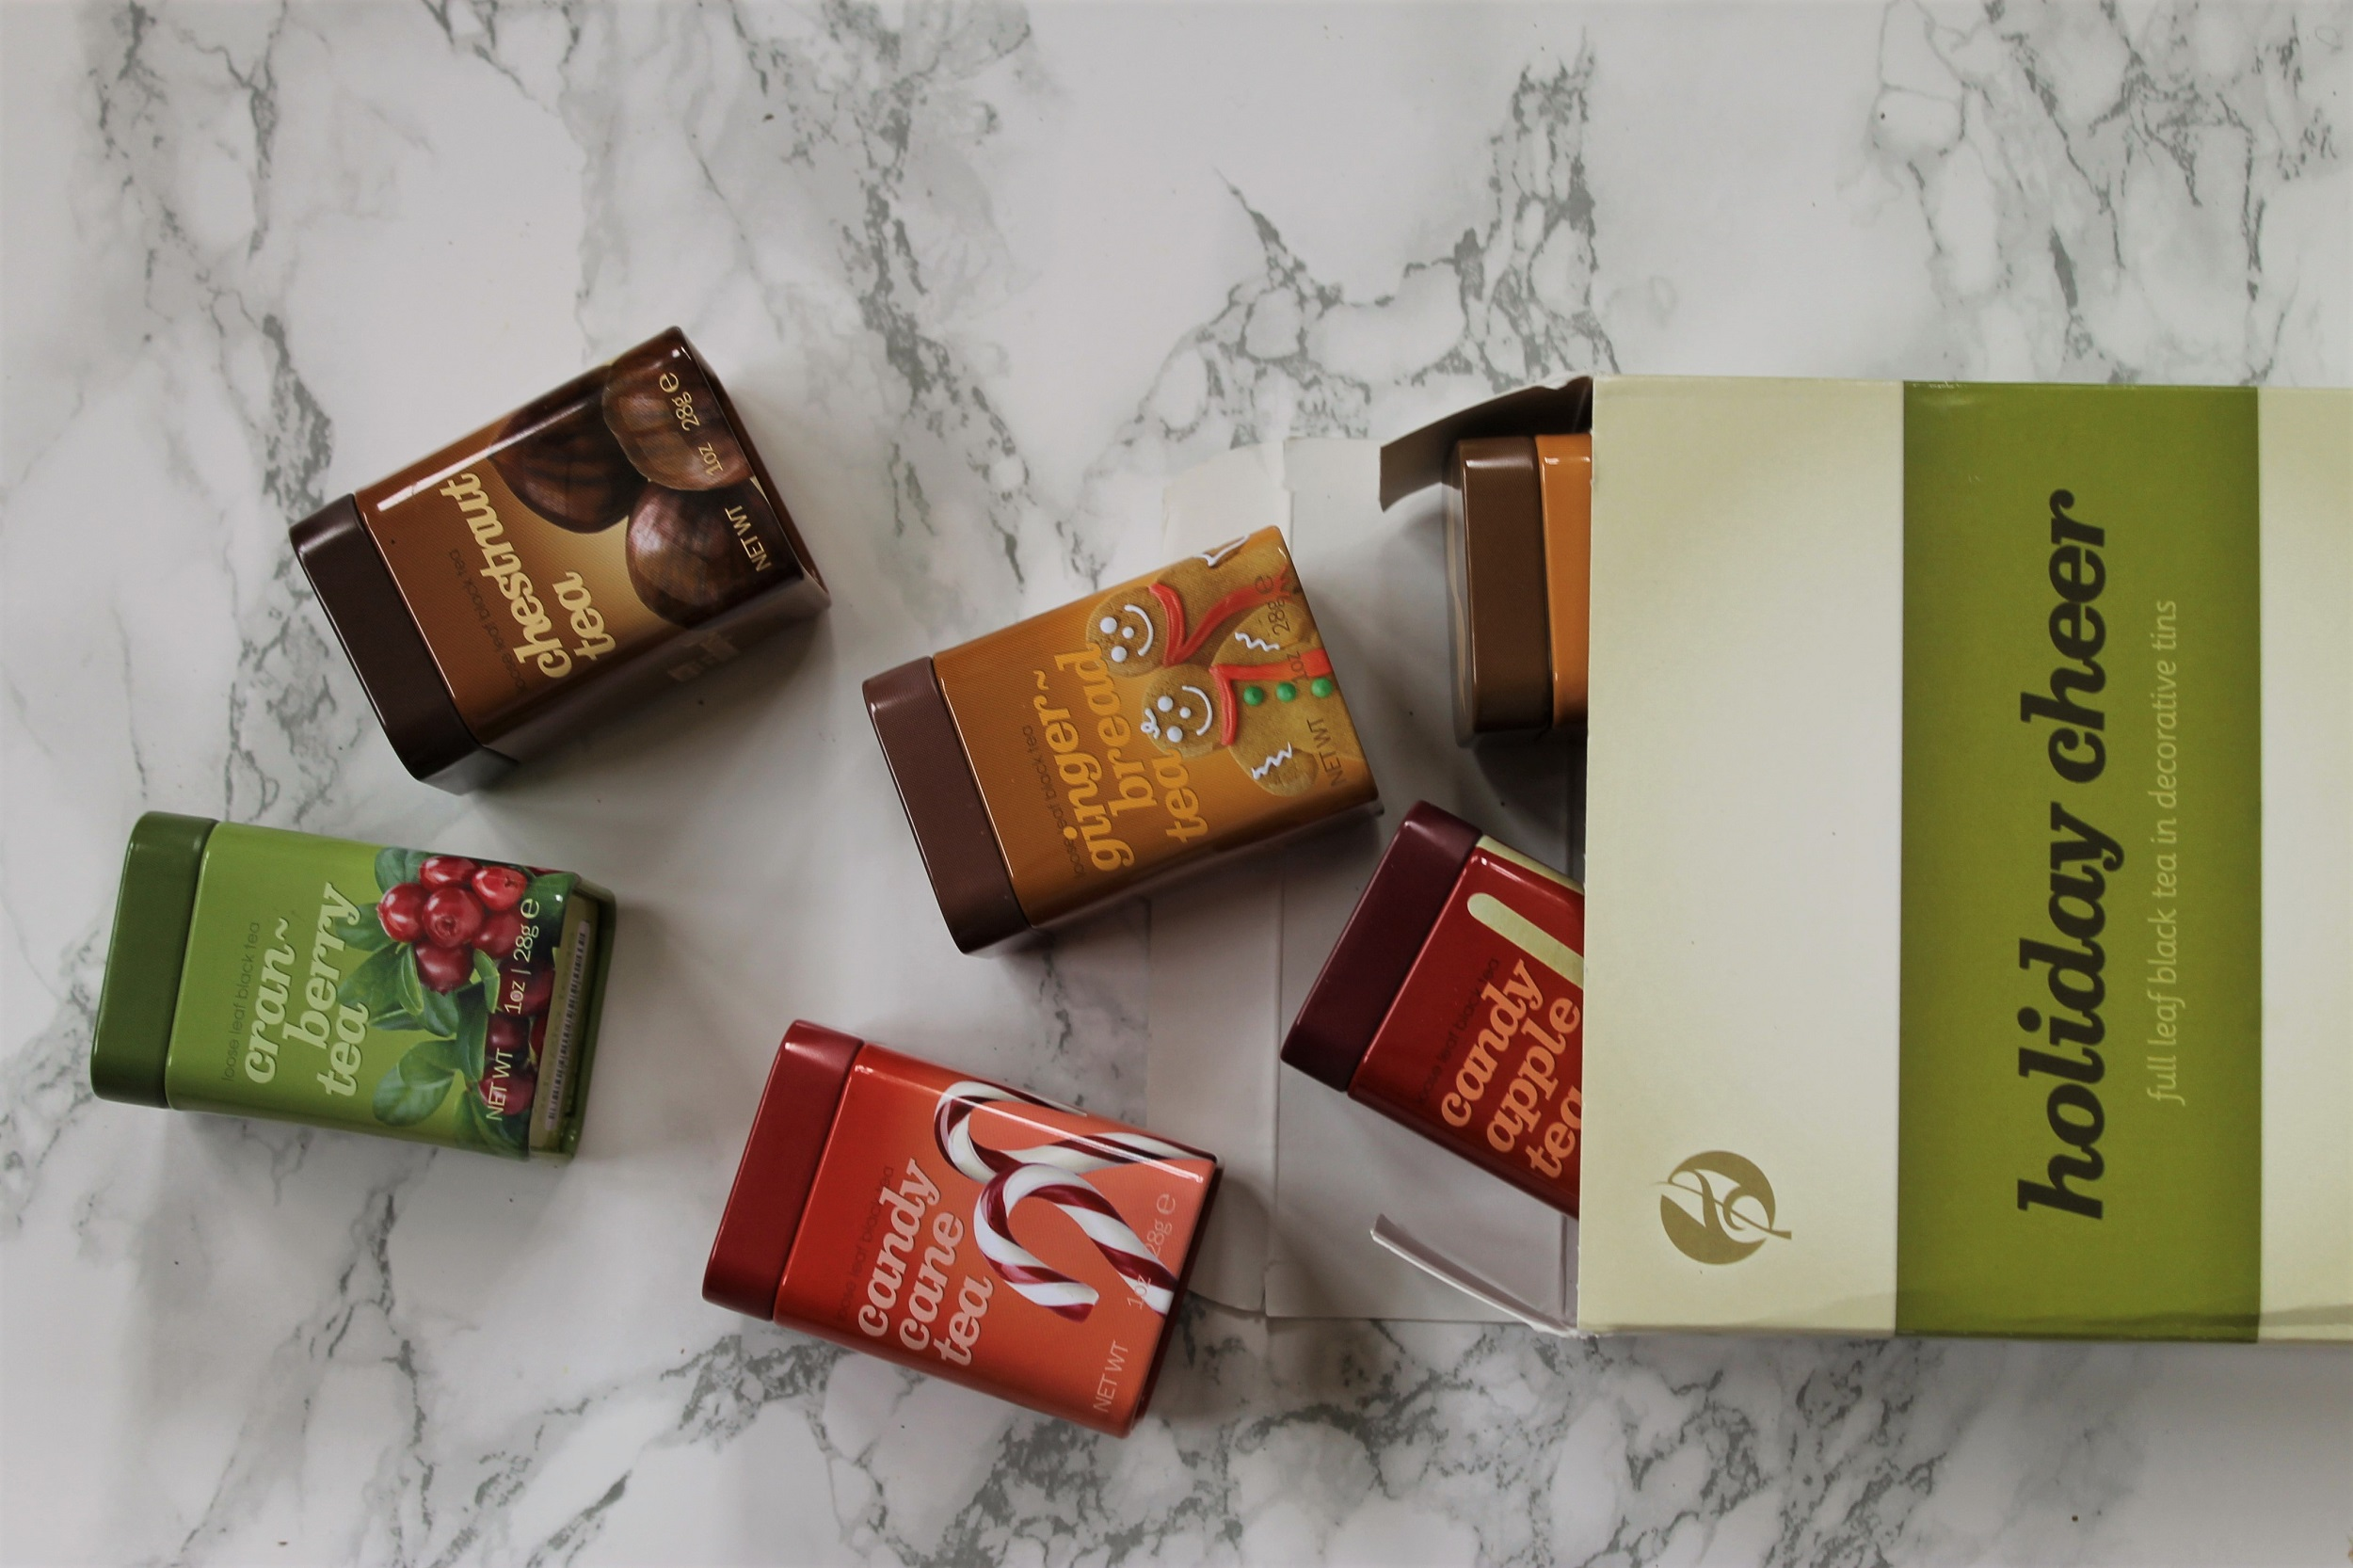 adagio teas stocking stuffers